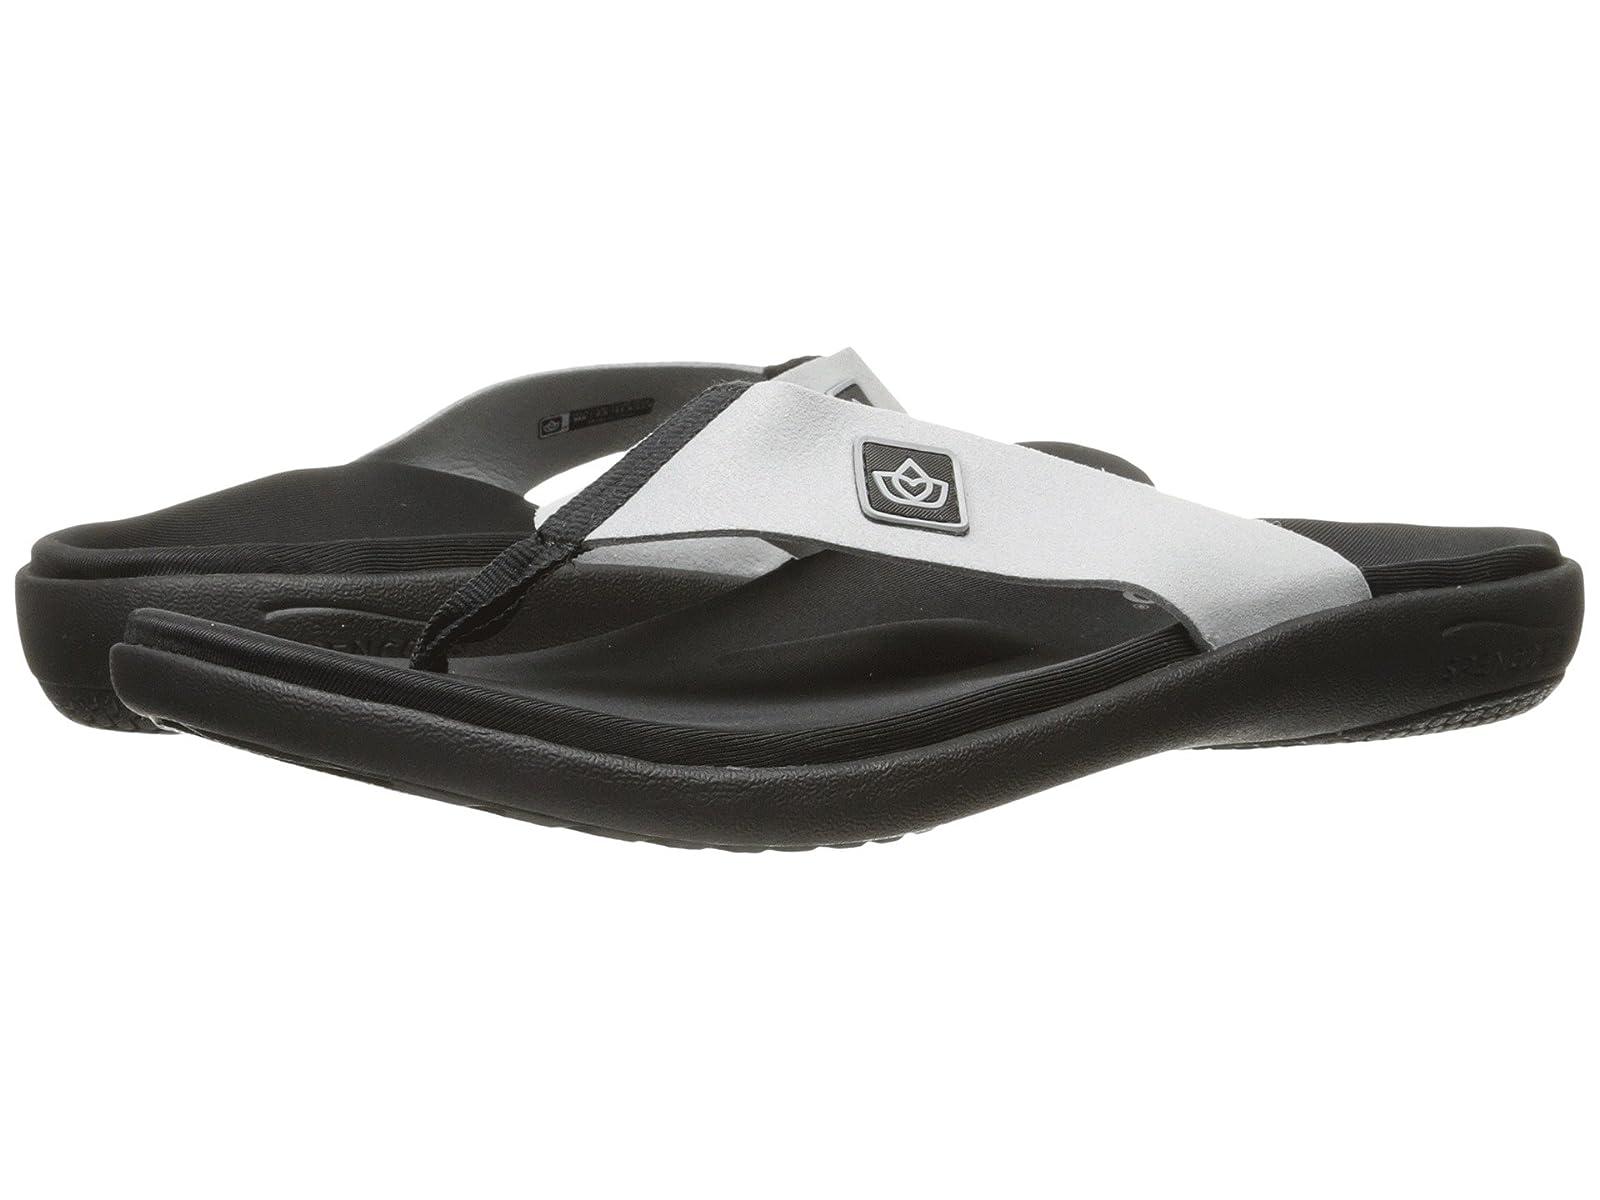 Spenco Pure SandalAtmospheric grades have affordable shoes